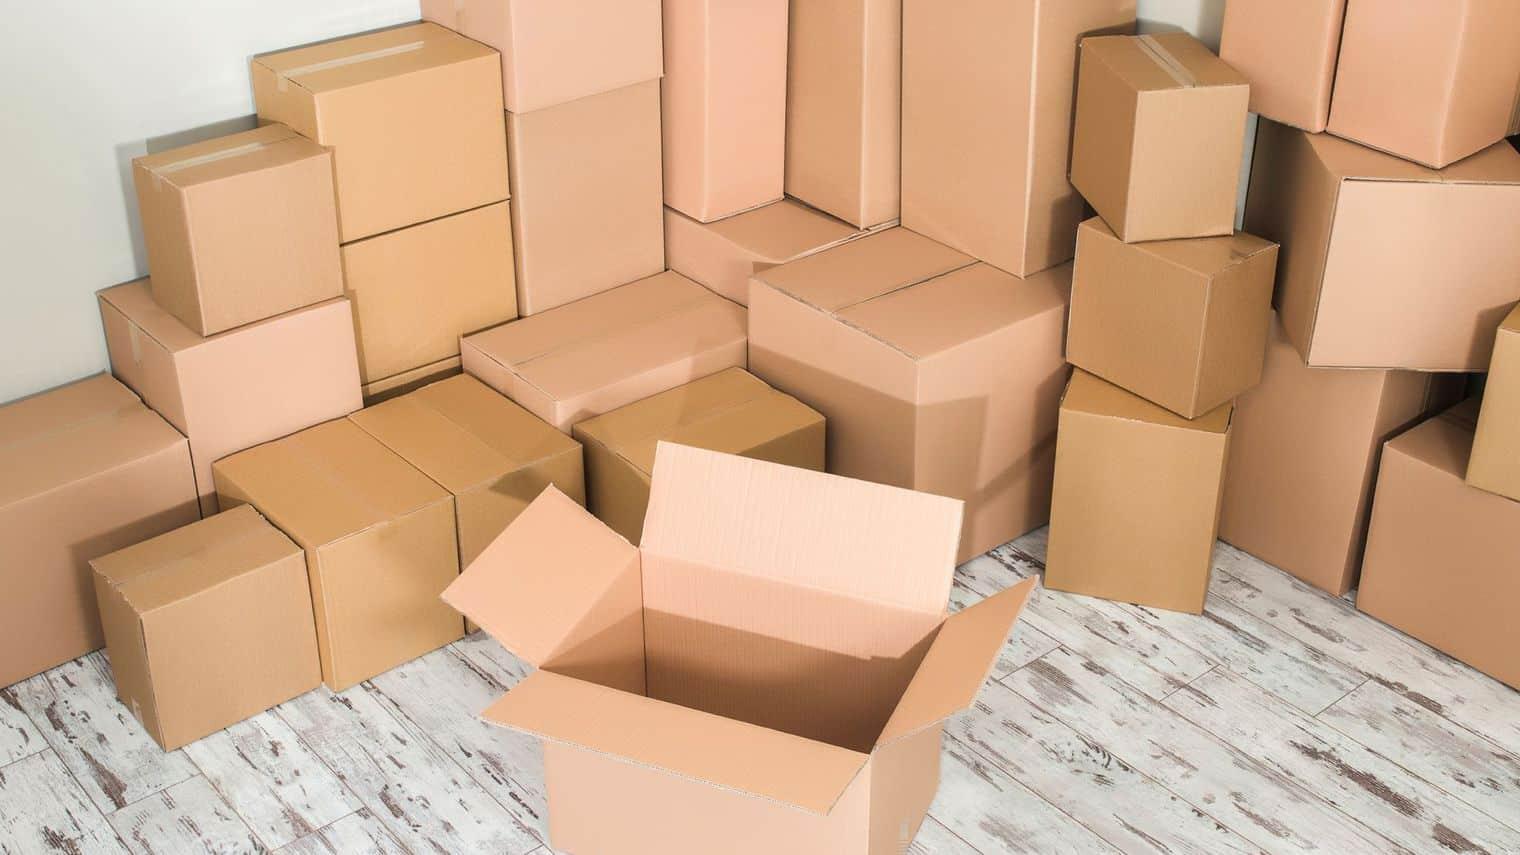 réussir déménagement